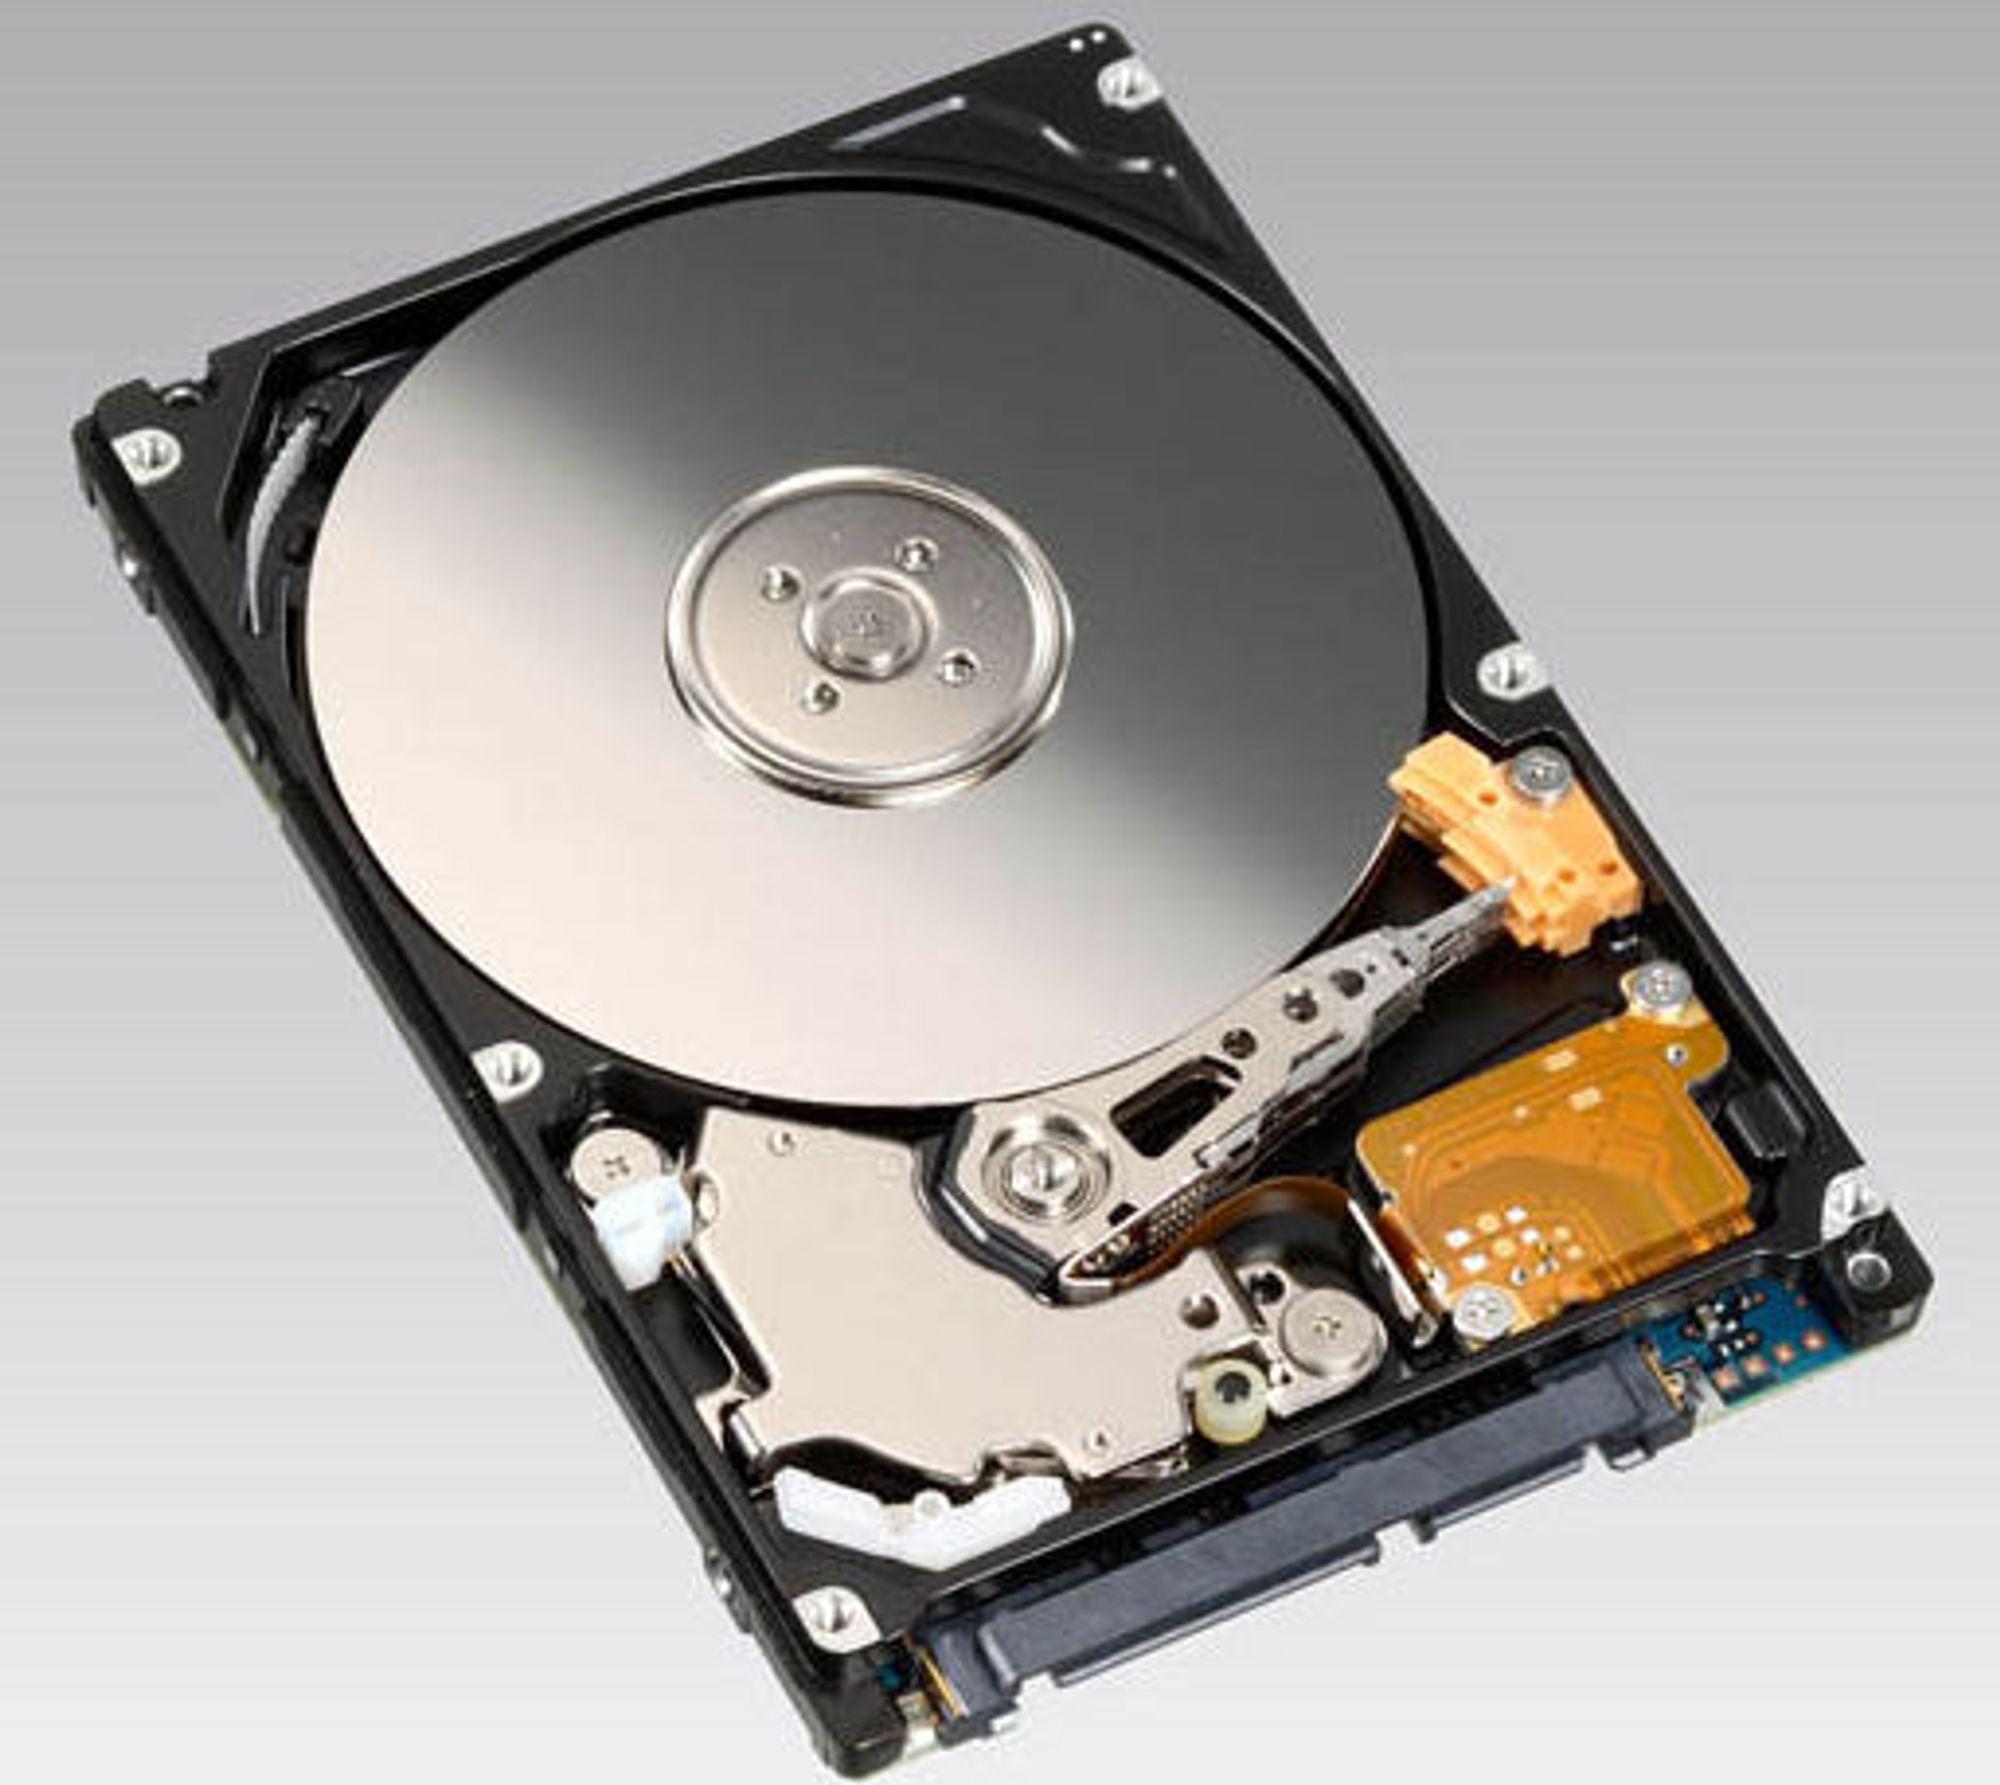 Opptil 320 GB: Fujitsu MHZ2 BH-serien